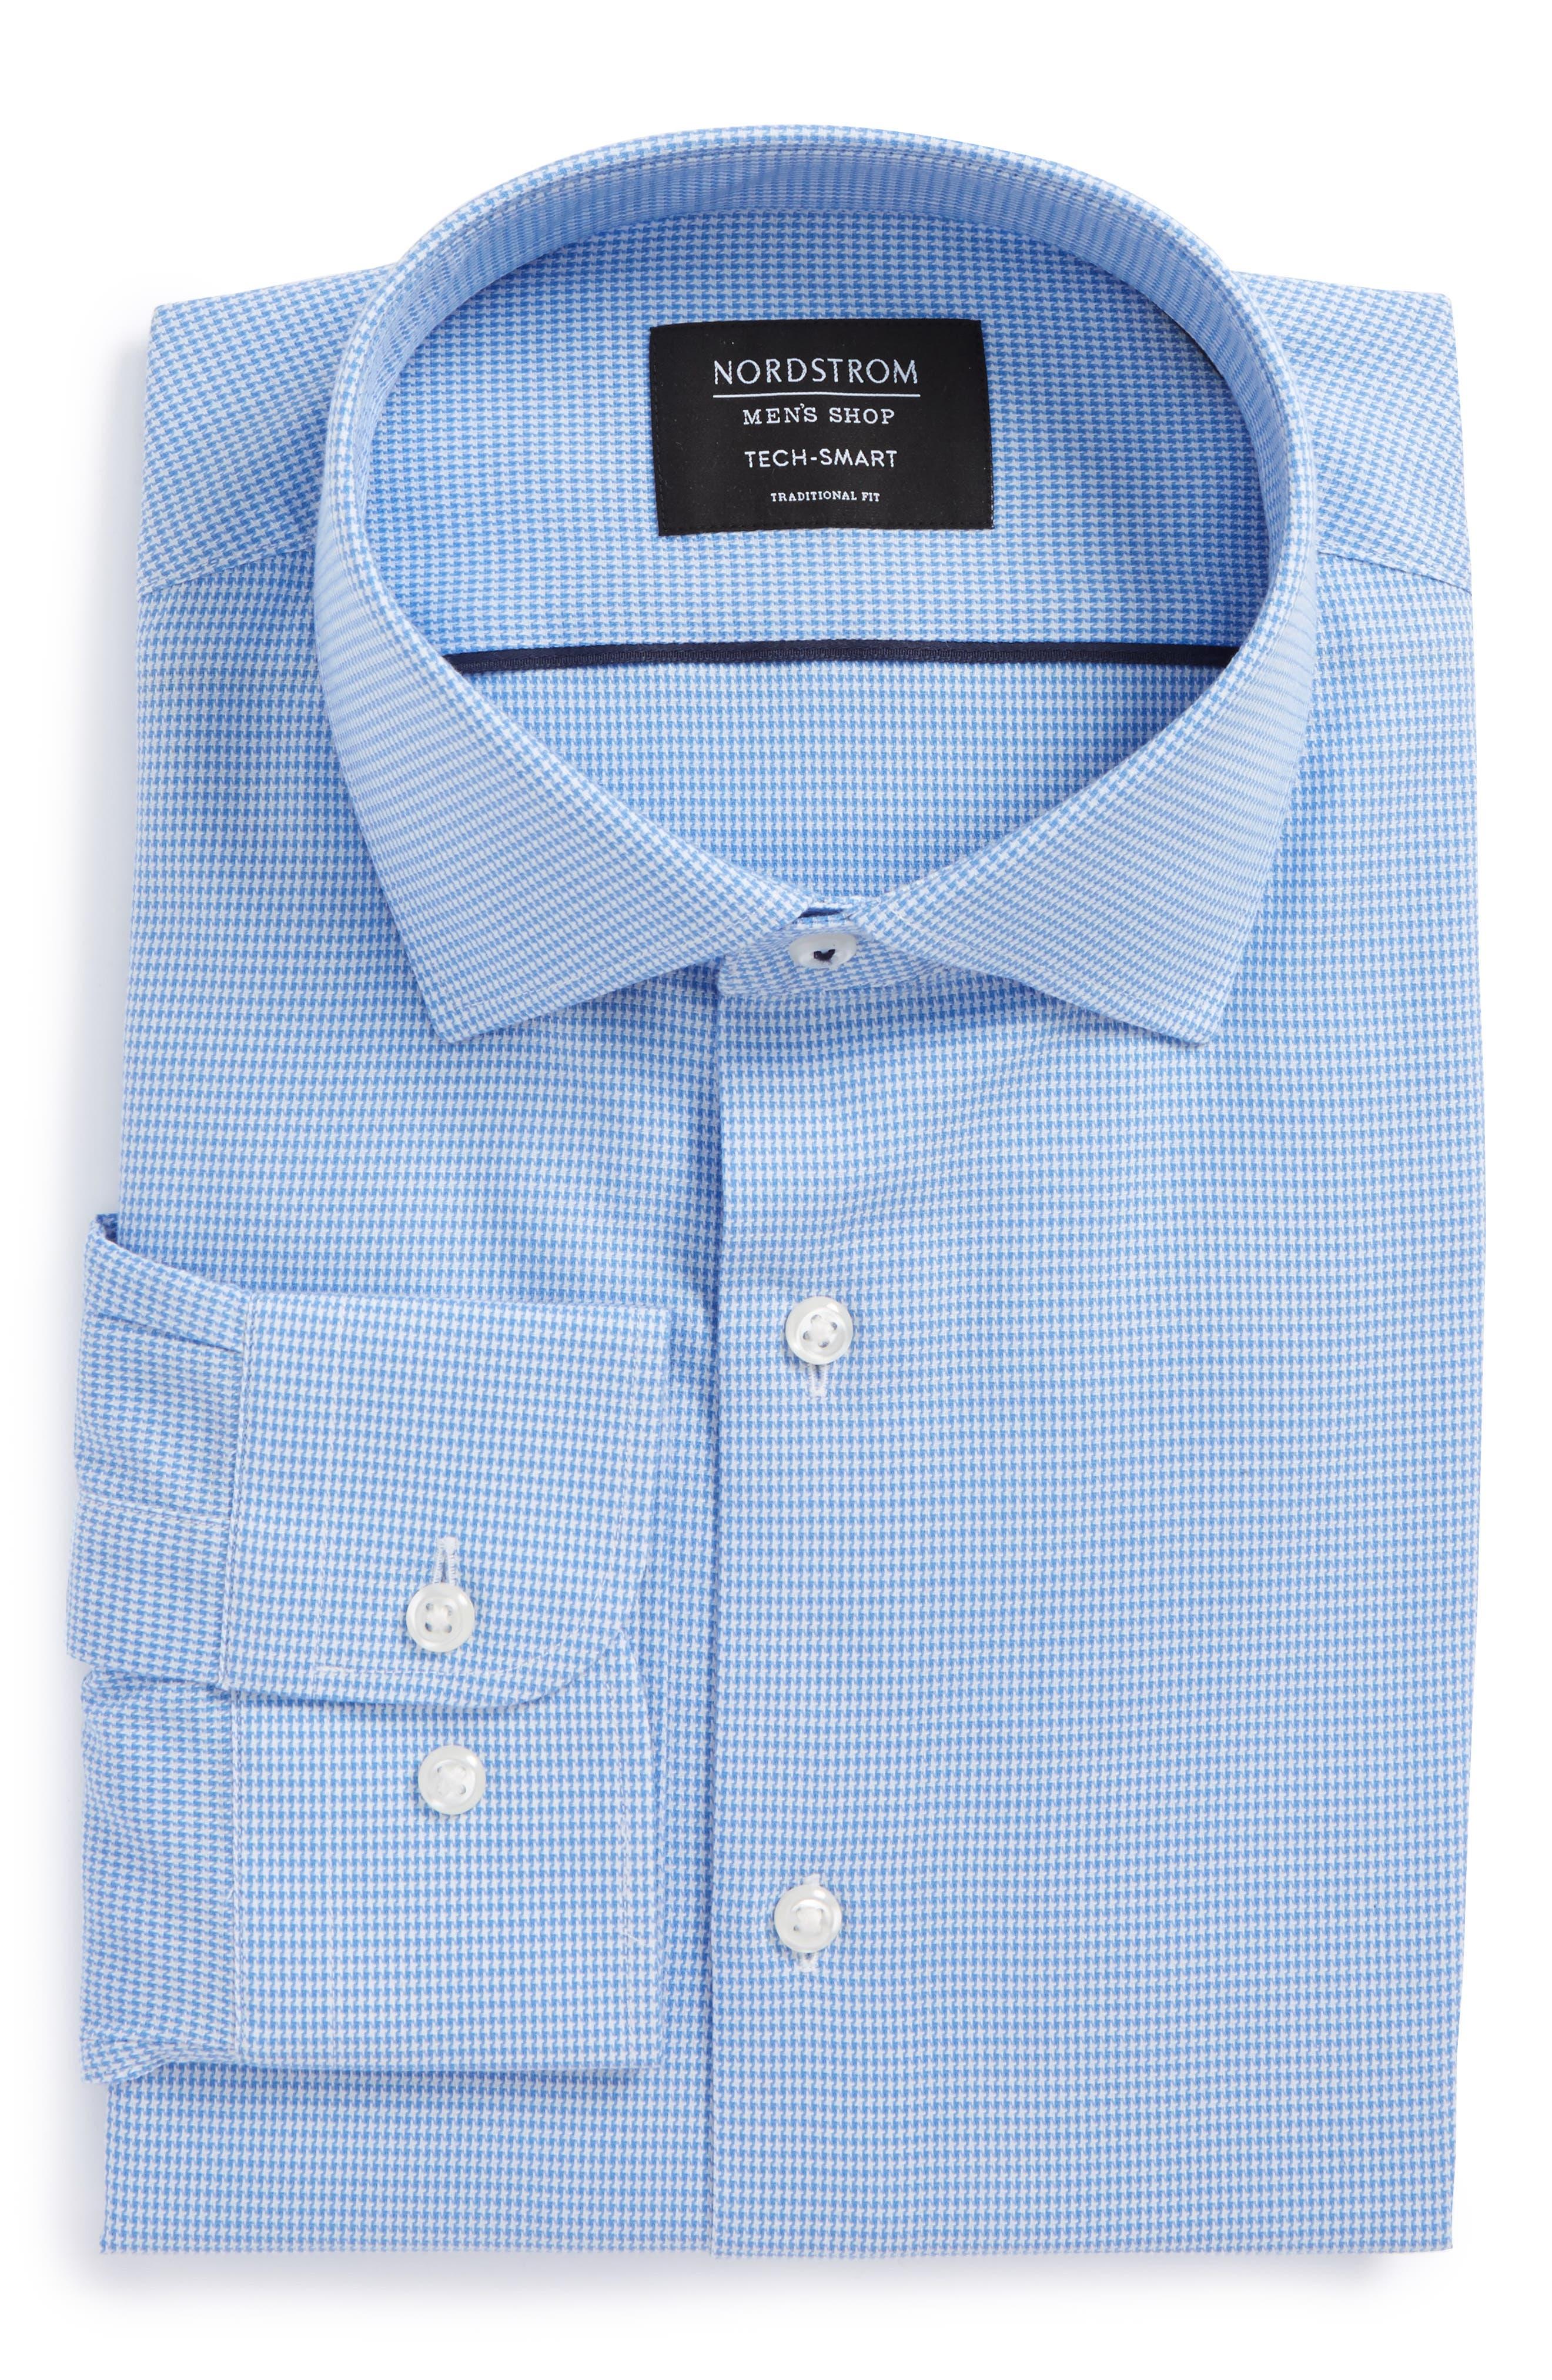 Nordstrom Men's Shop Tech-Smart Traditional Fit Houndstooth Dress Shirt